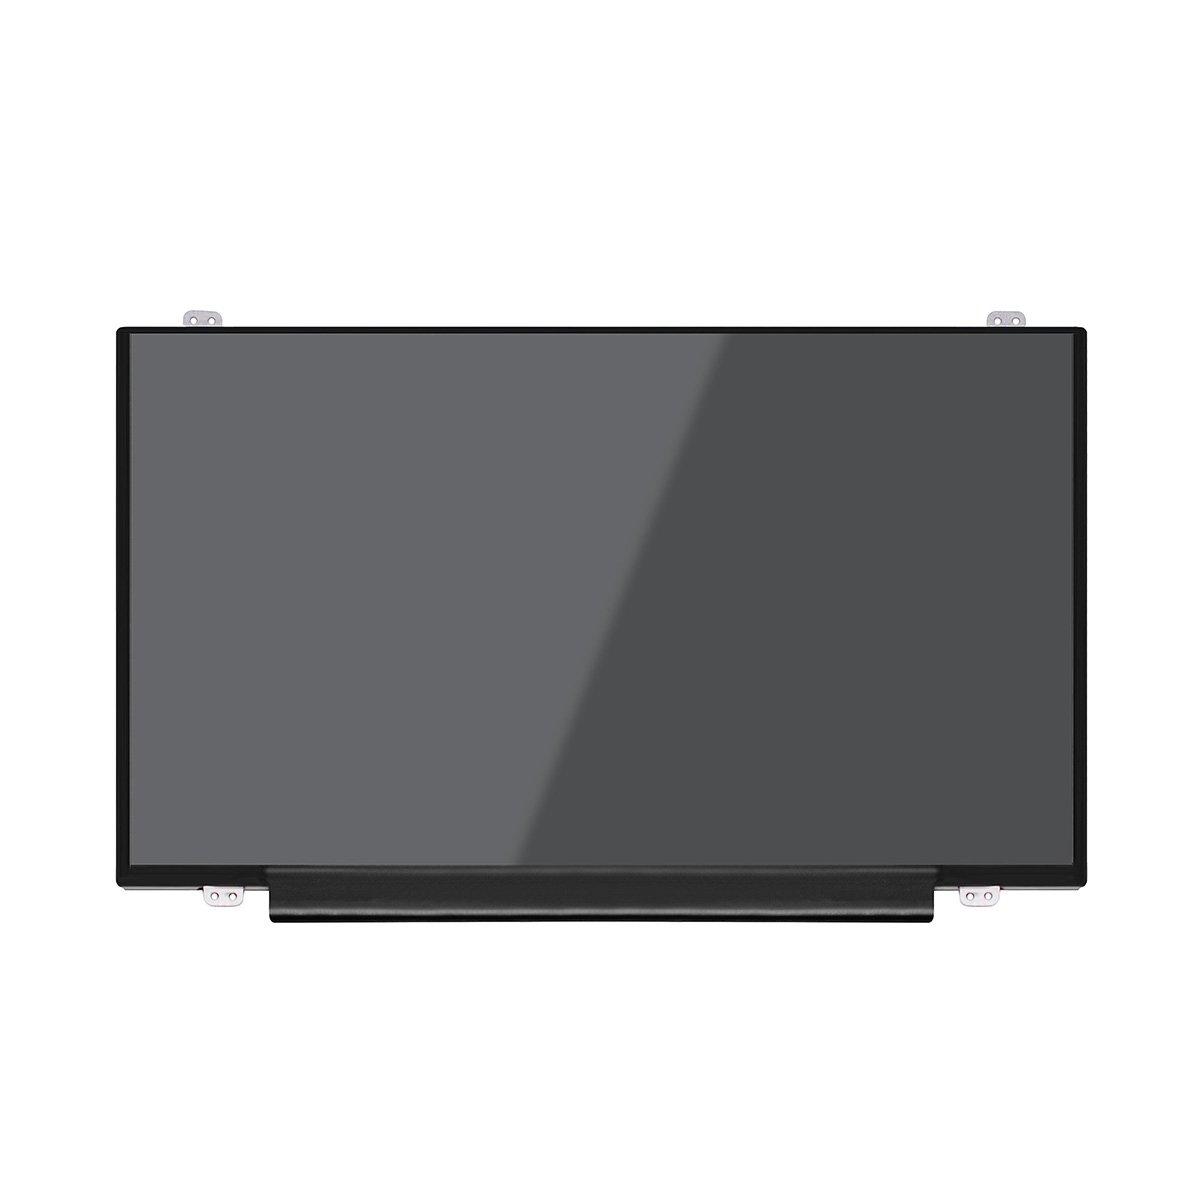 LCDOLED® 14.0インチ(日本発送) Dell Vostro 14 5000 5468 5471用 FullHD 1080P IPS LED LCD 液晶ディスプレイ 修理交換用液晶パネル(日本発送) B07DNRTCN2